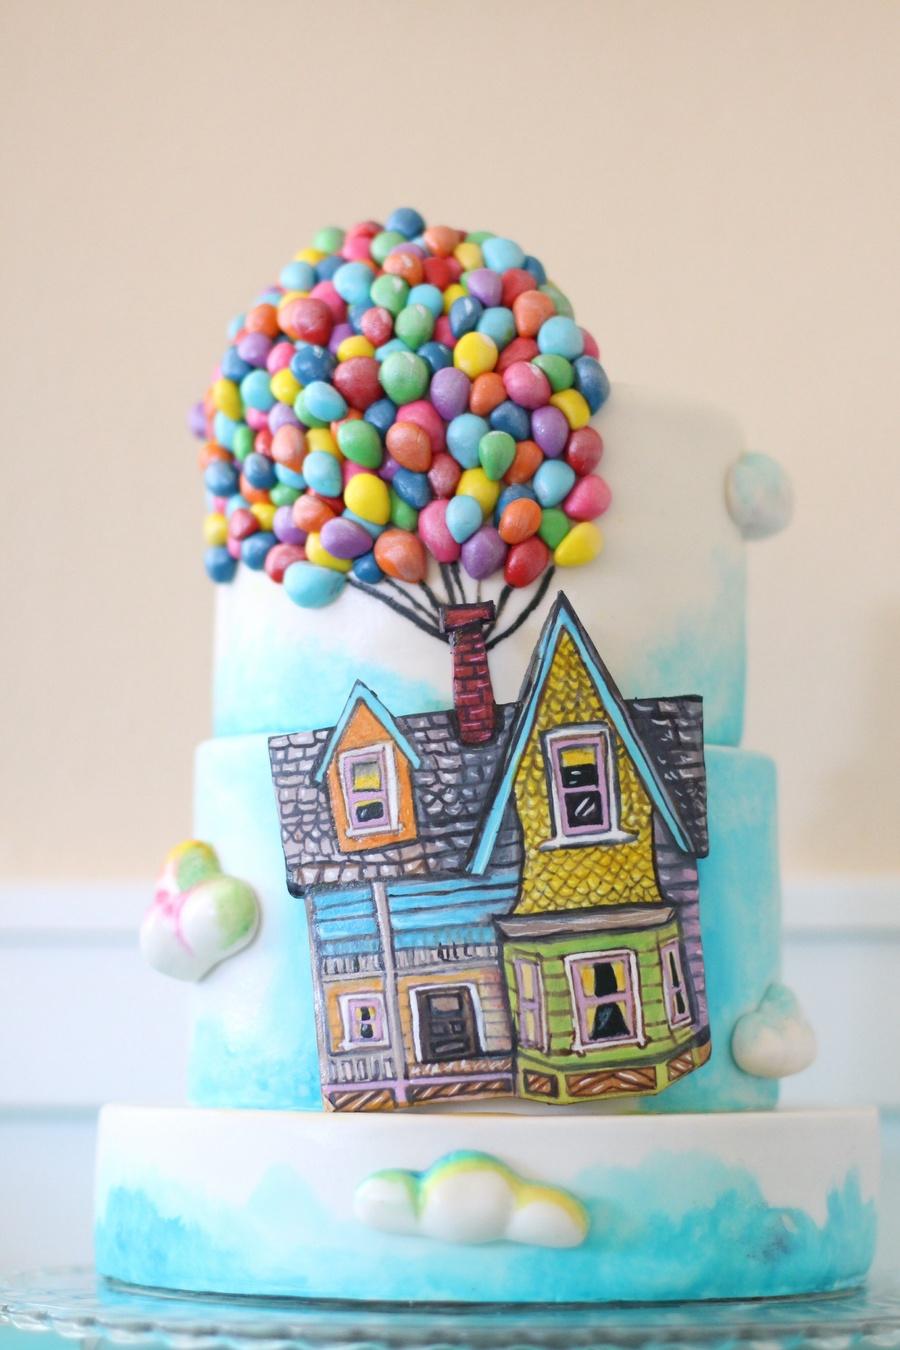 Up House Balloons Up Themed Cake A Billion Tiny Hand Made Fondant Balloons Hand